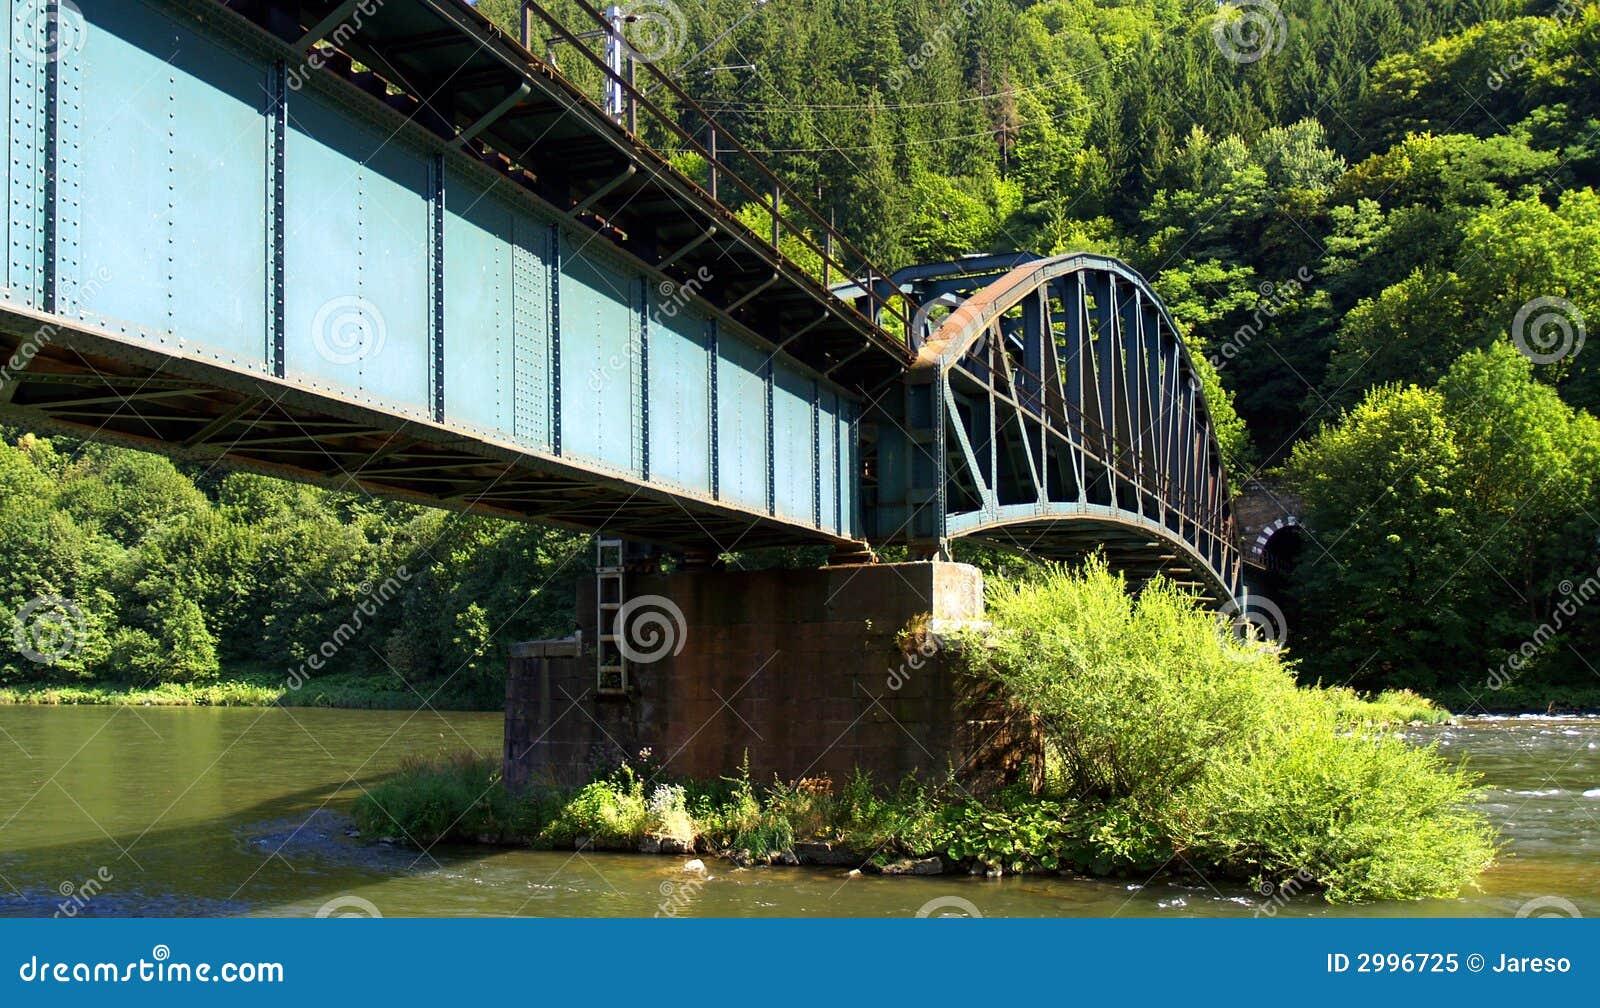 Railroad bridge over water